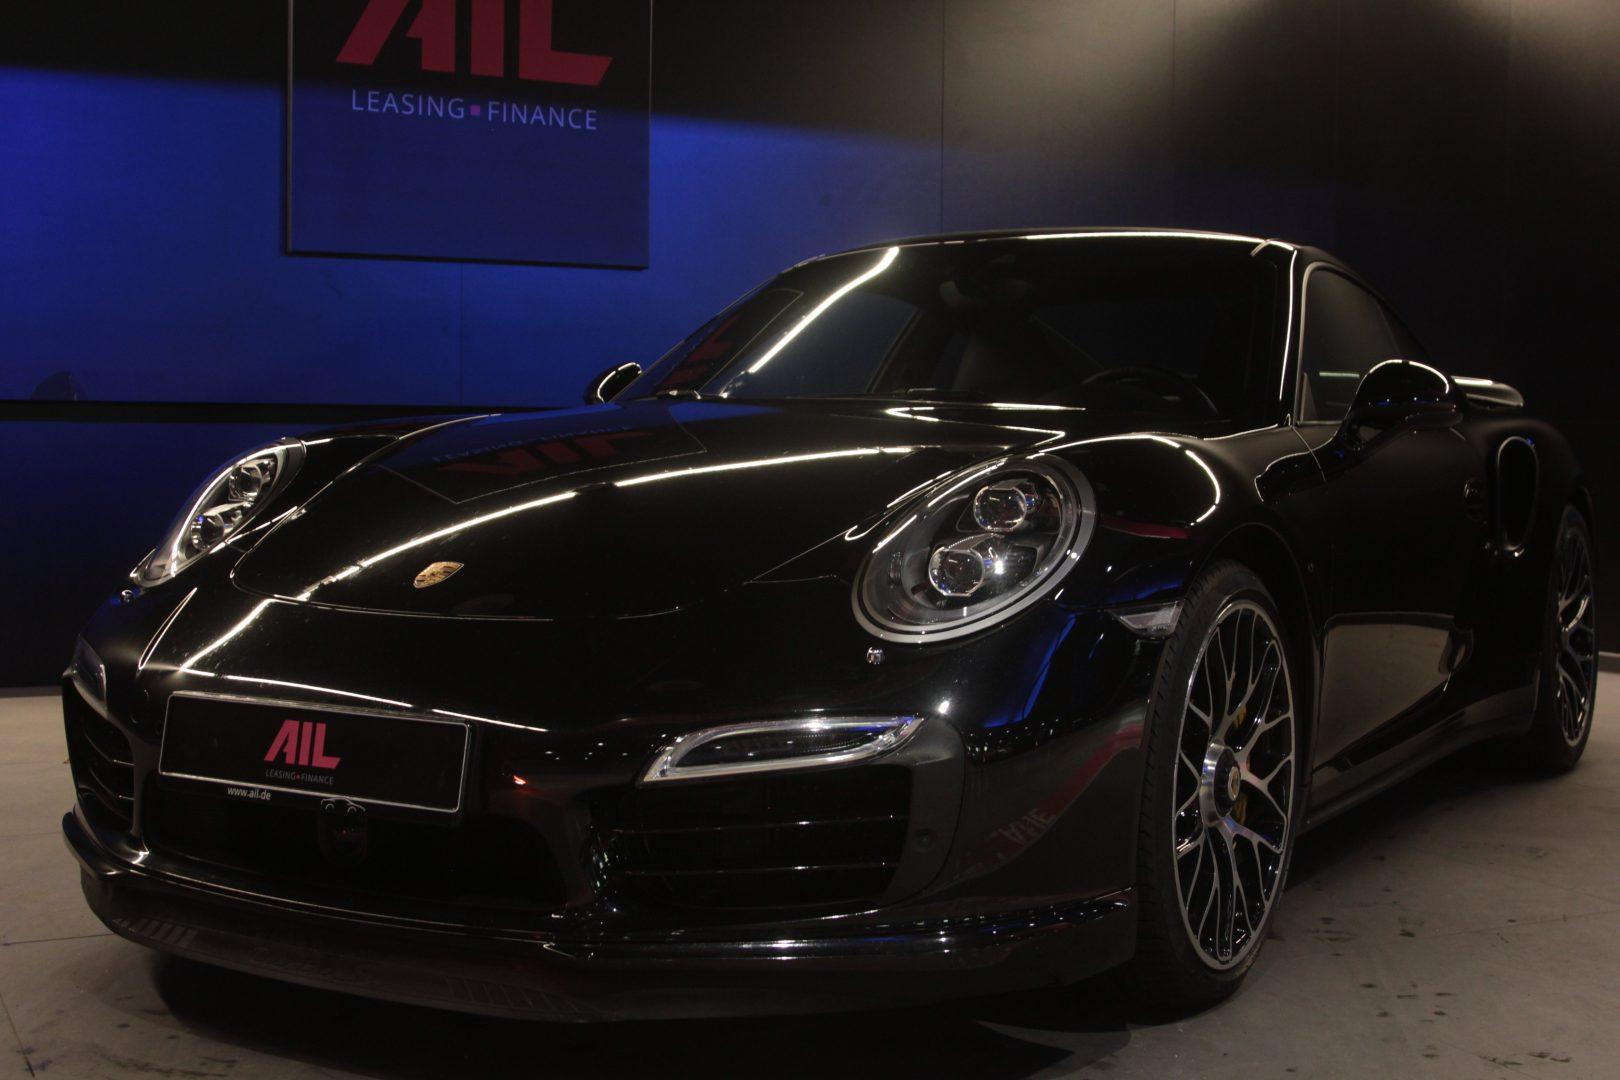 AIL Porsche 991 Turbo S Ceramic LED Sport Chrono Paket 5